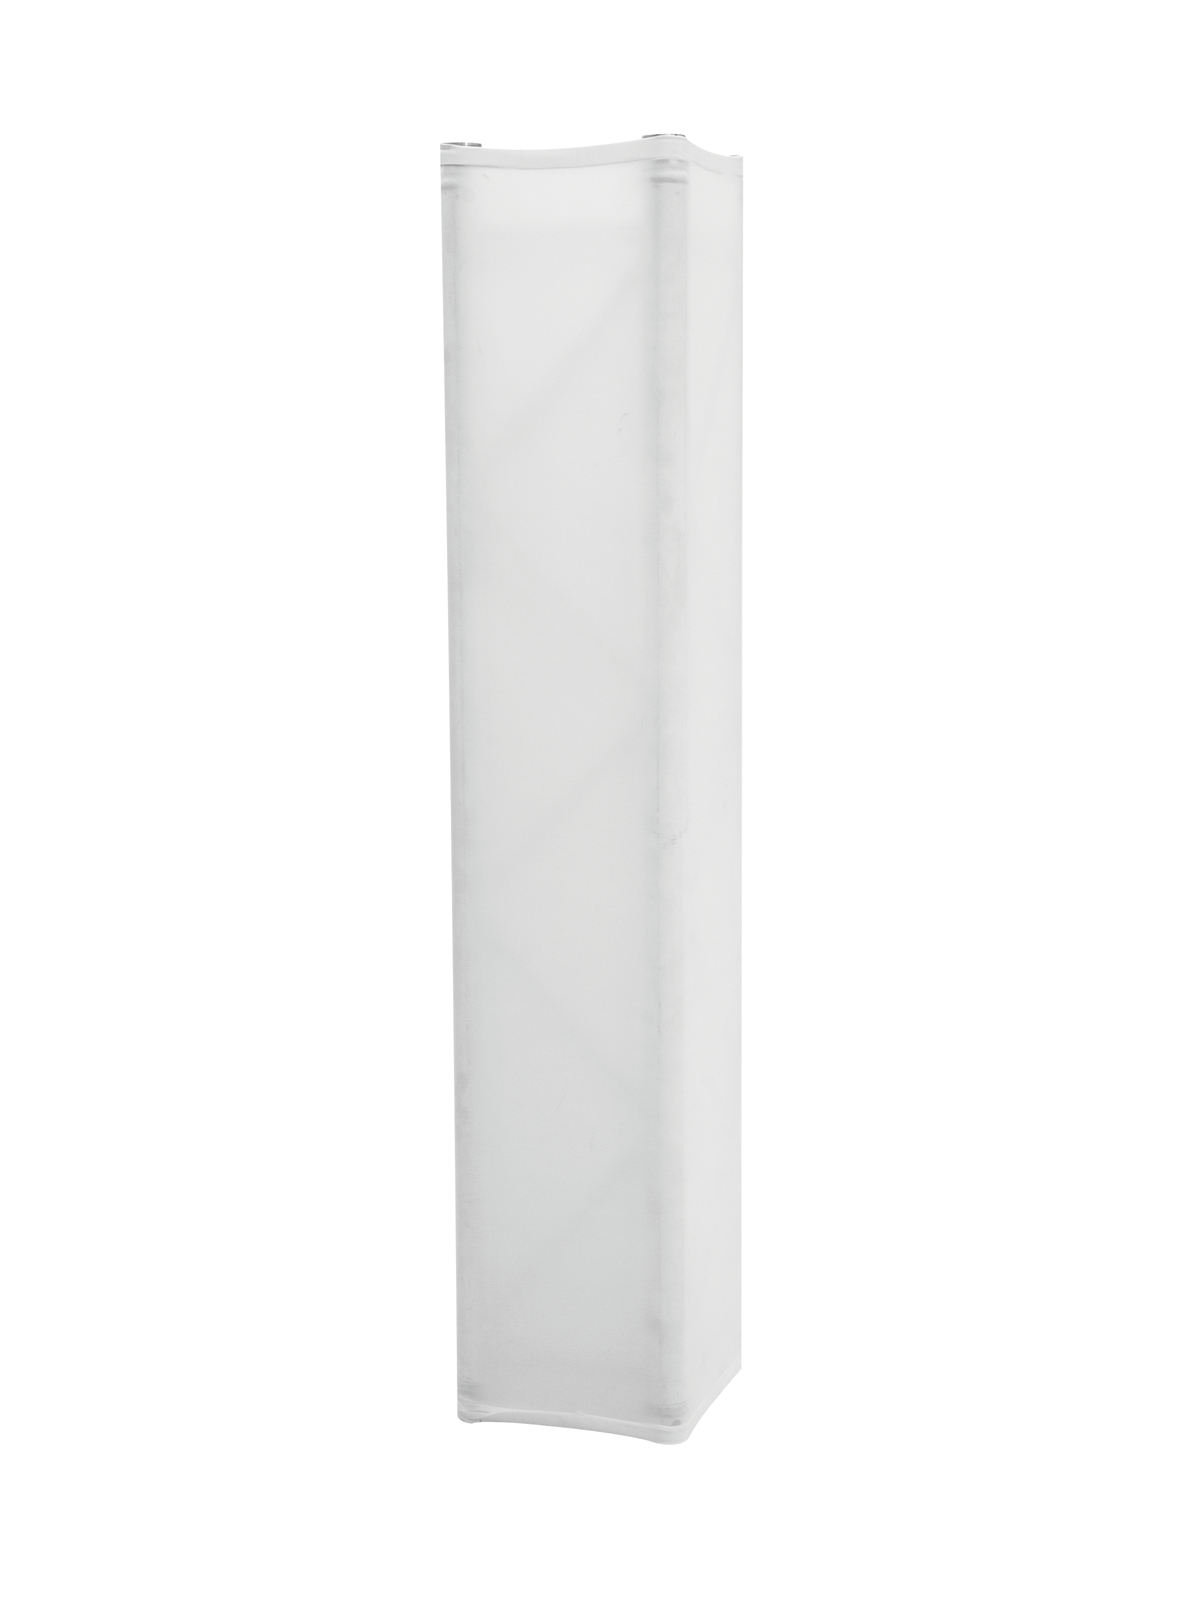 Kryt elastický pro konstrukci 150cm, bílý